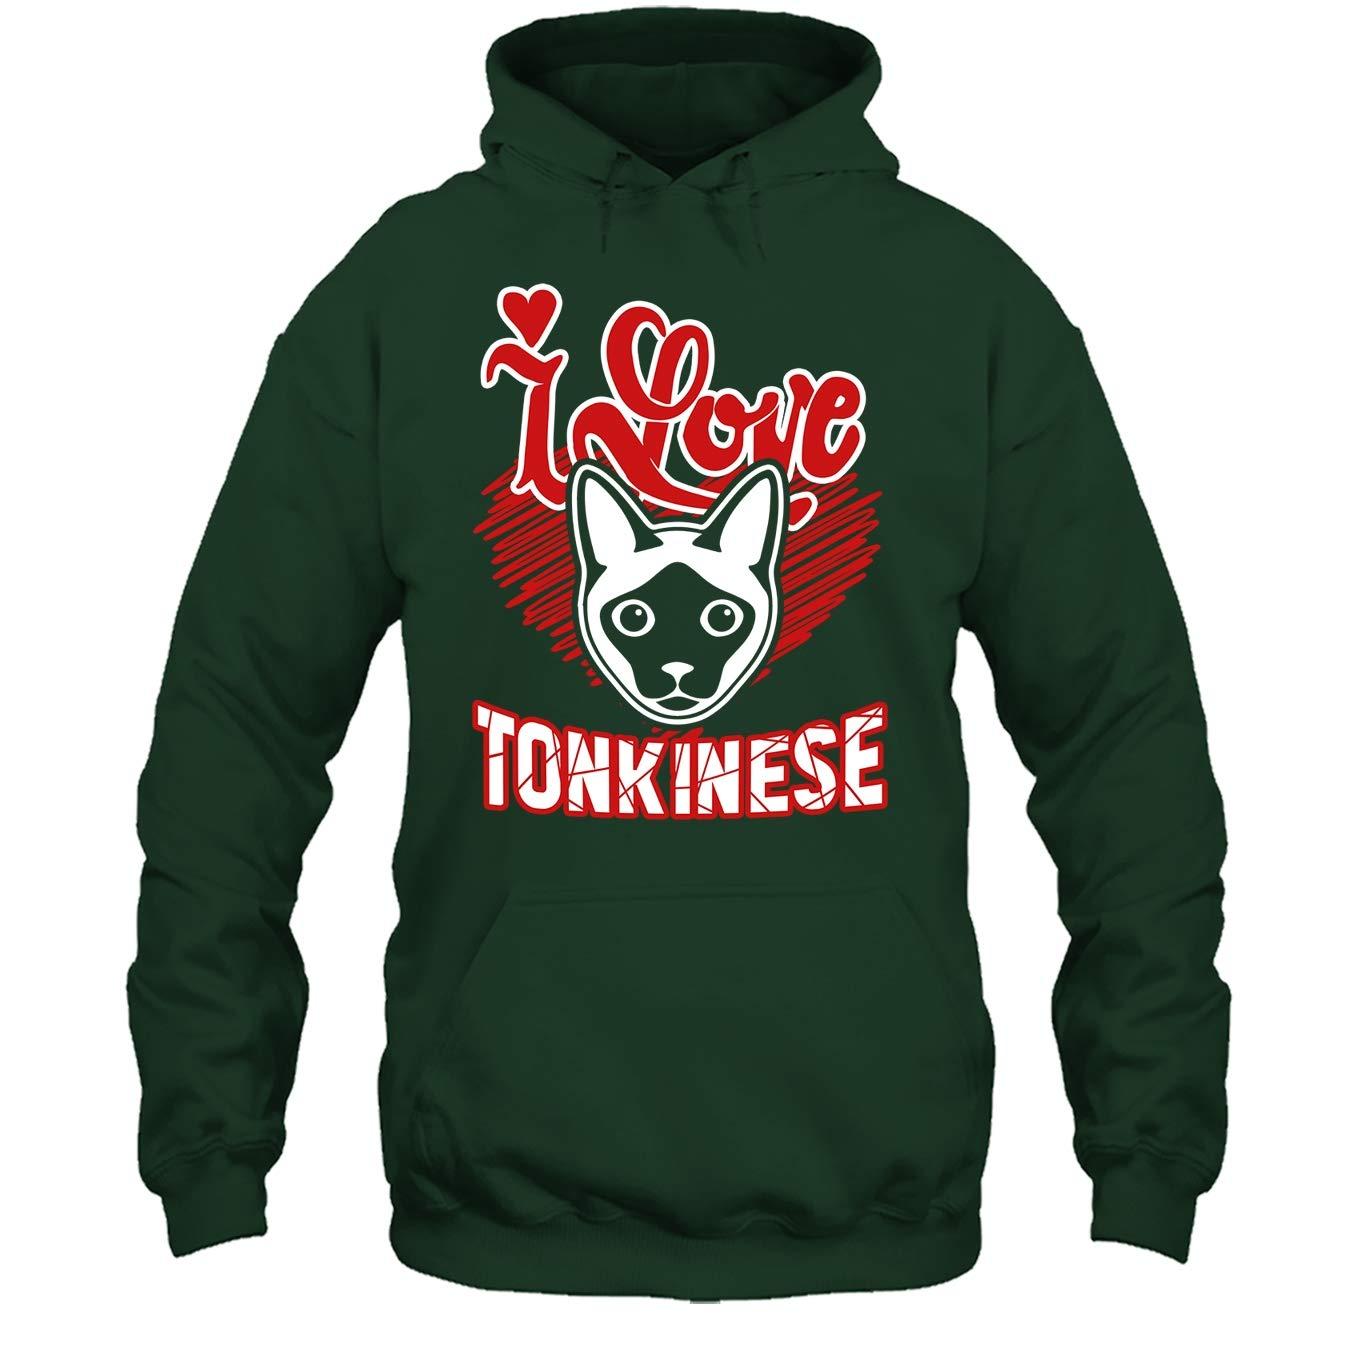 Tonkinese Tshirt Design I Love Tonkinese Cat T Shirt